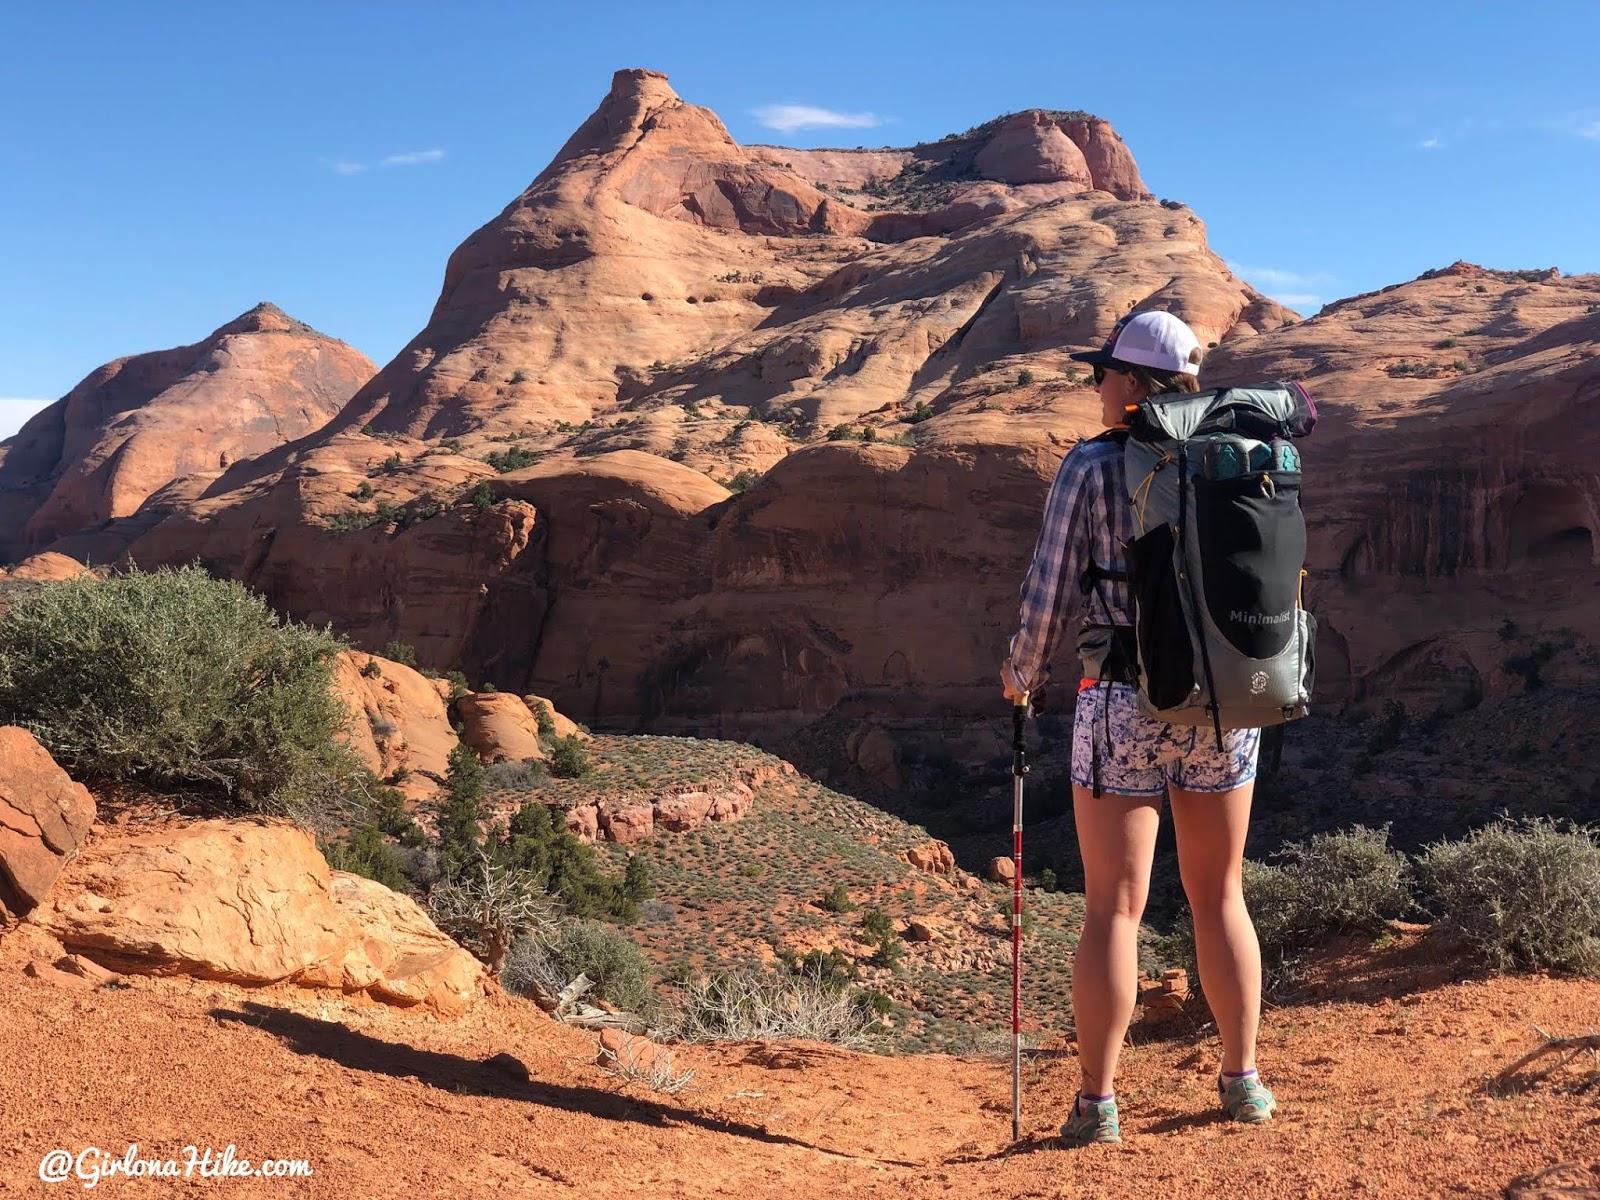 Backpacking to Rainbow Bridge National Monument